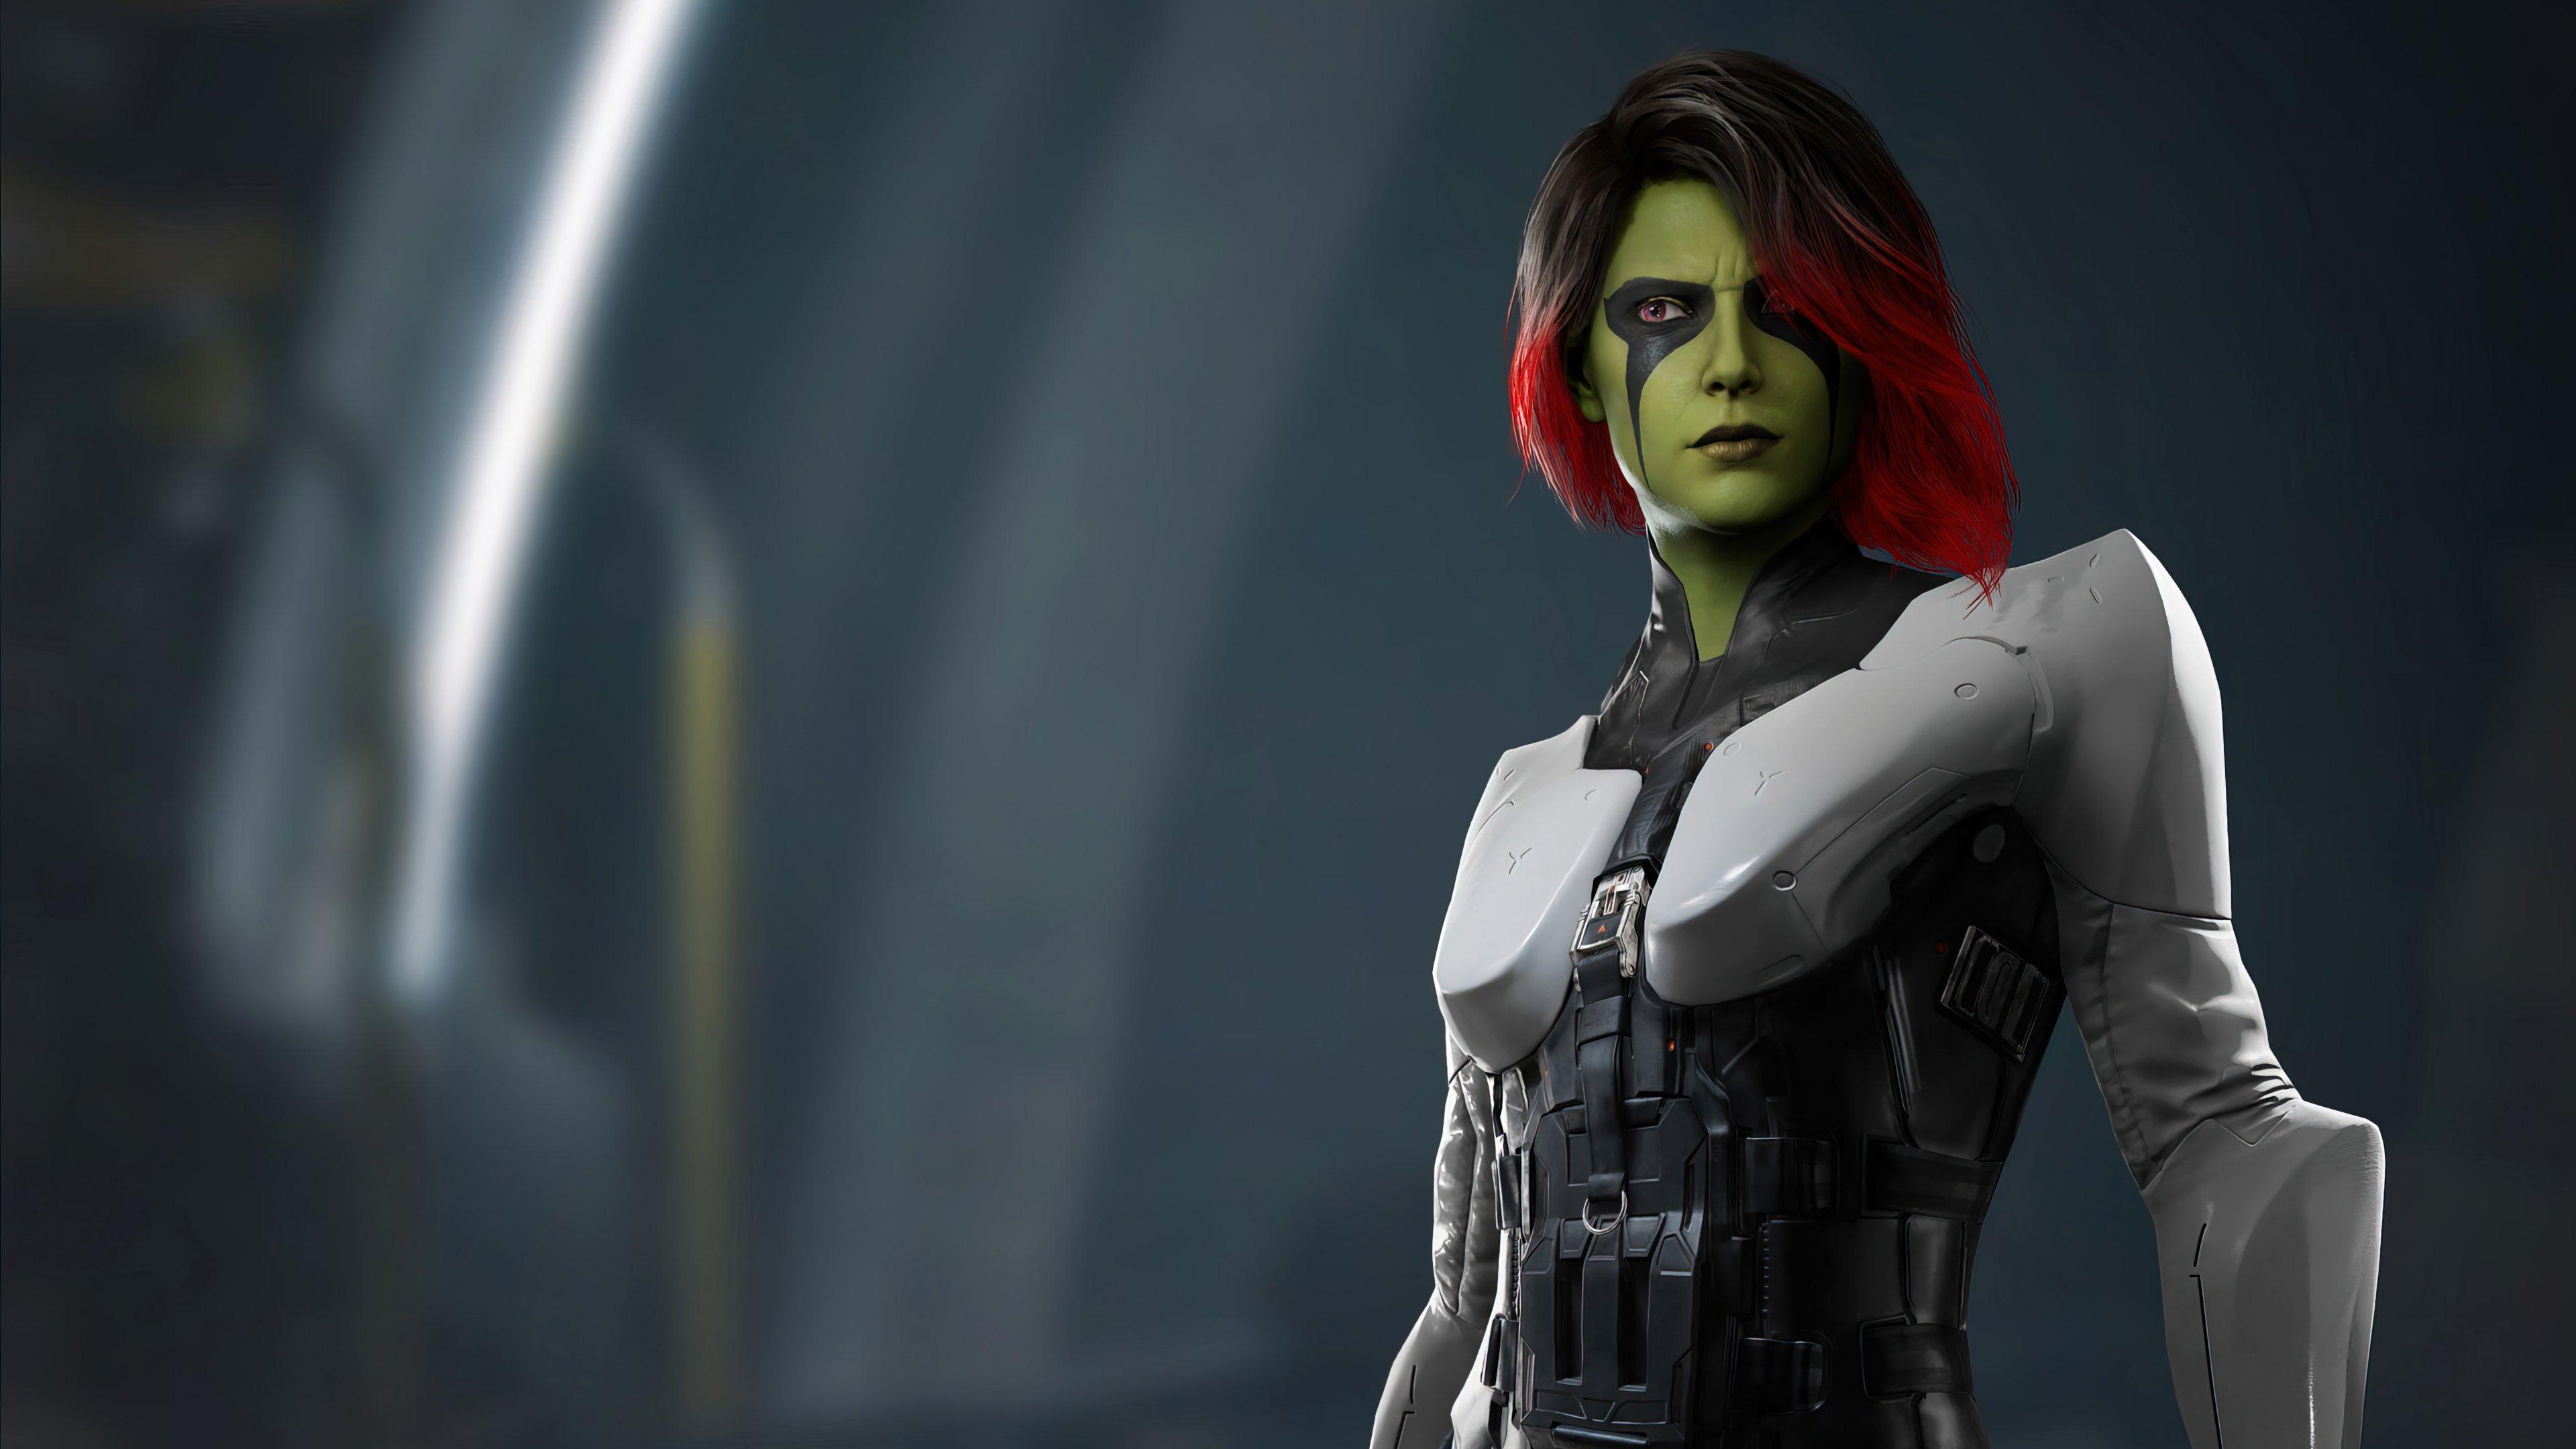 Fondos de pantalla Gamora Marvels Guardianes de la galaxia